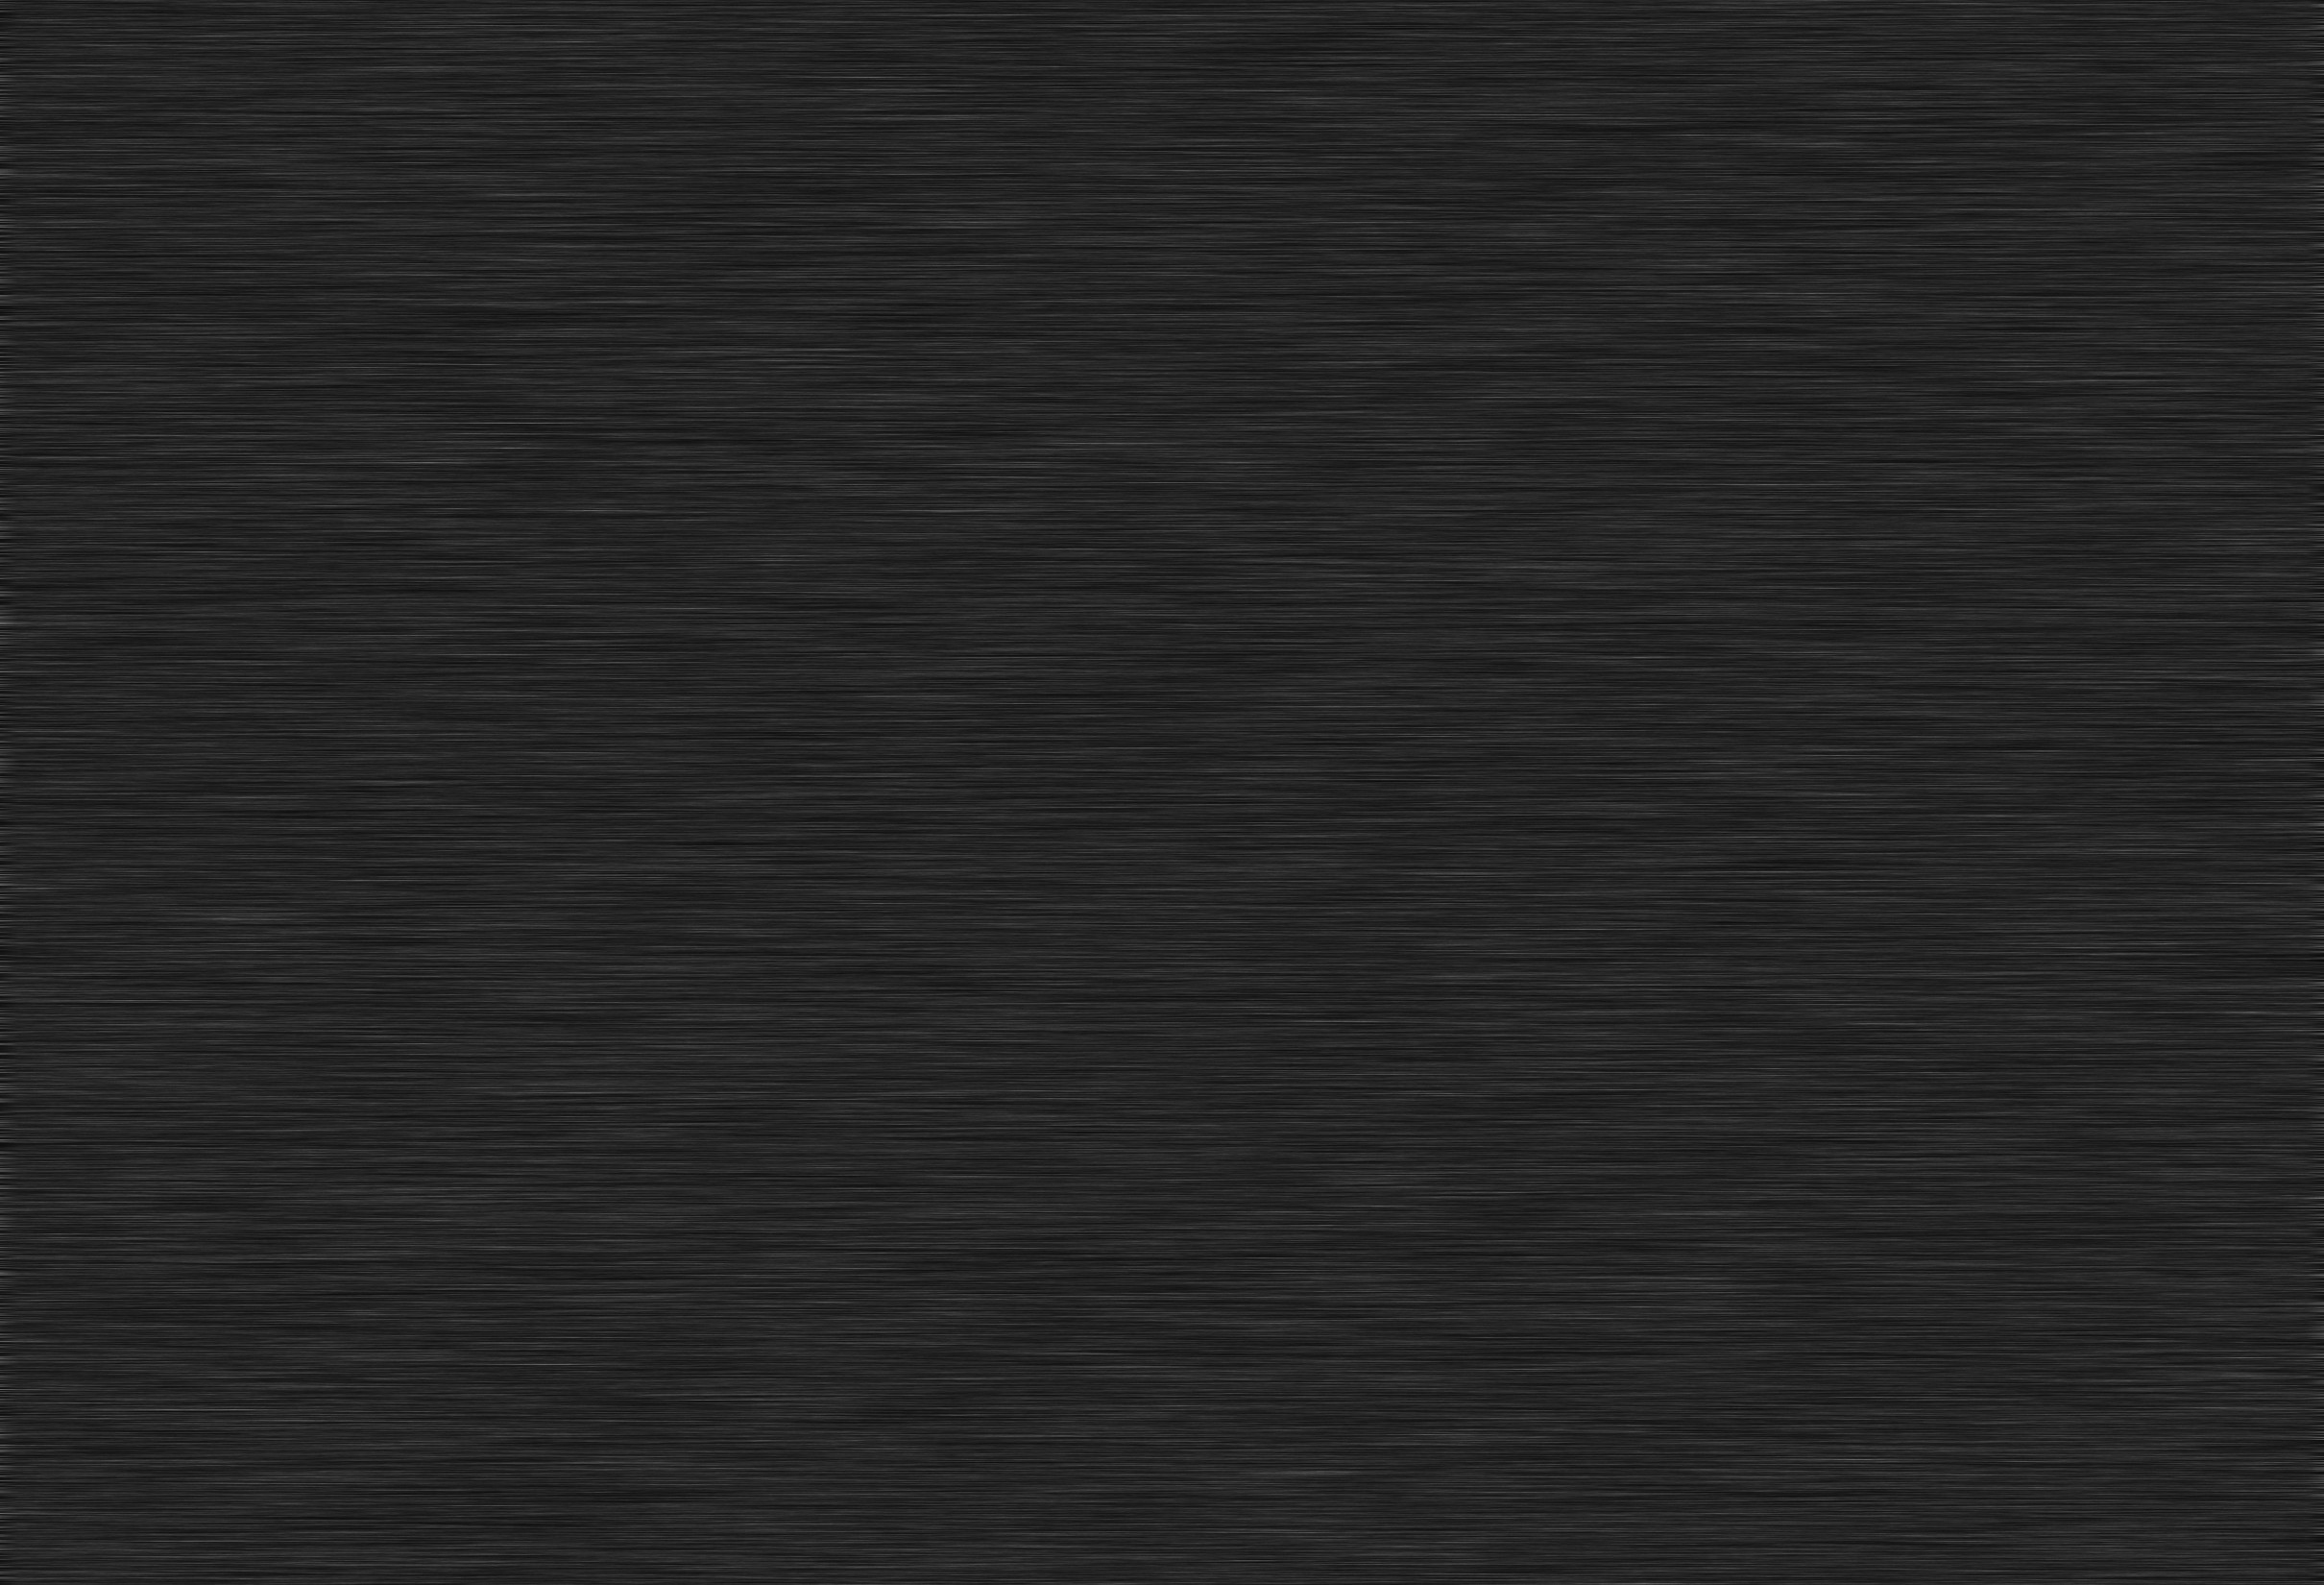 Black metal texture Bronze 2420x1650 Black Metal Texture Home Decorating Ideas Download 1920x1200 Getwallpaperscom Black Metal Backgrounds 51 Images